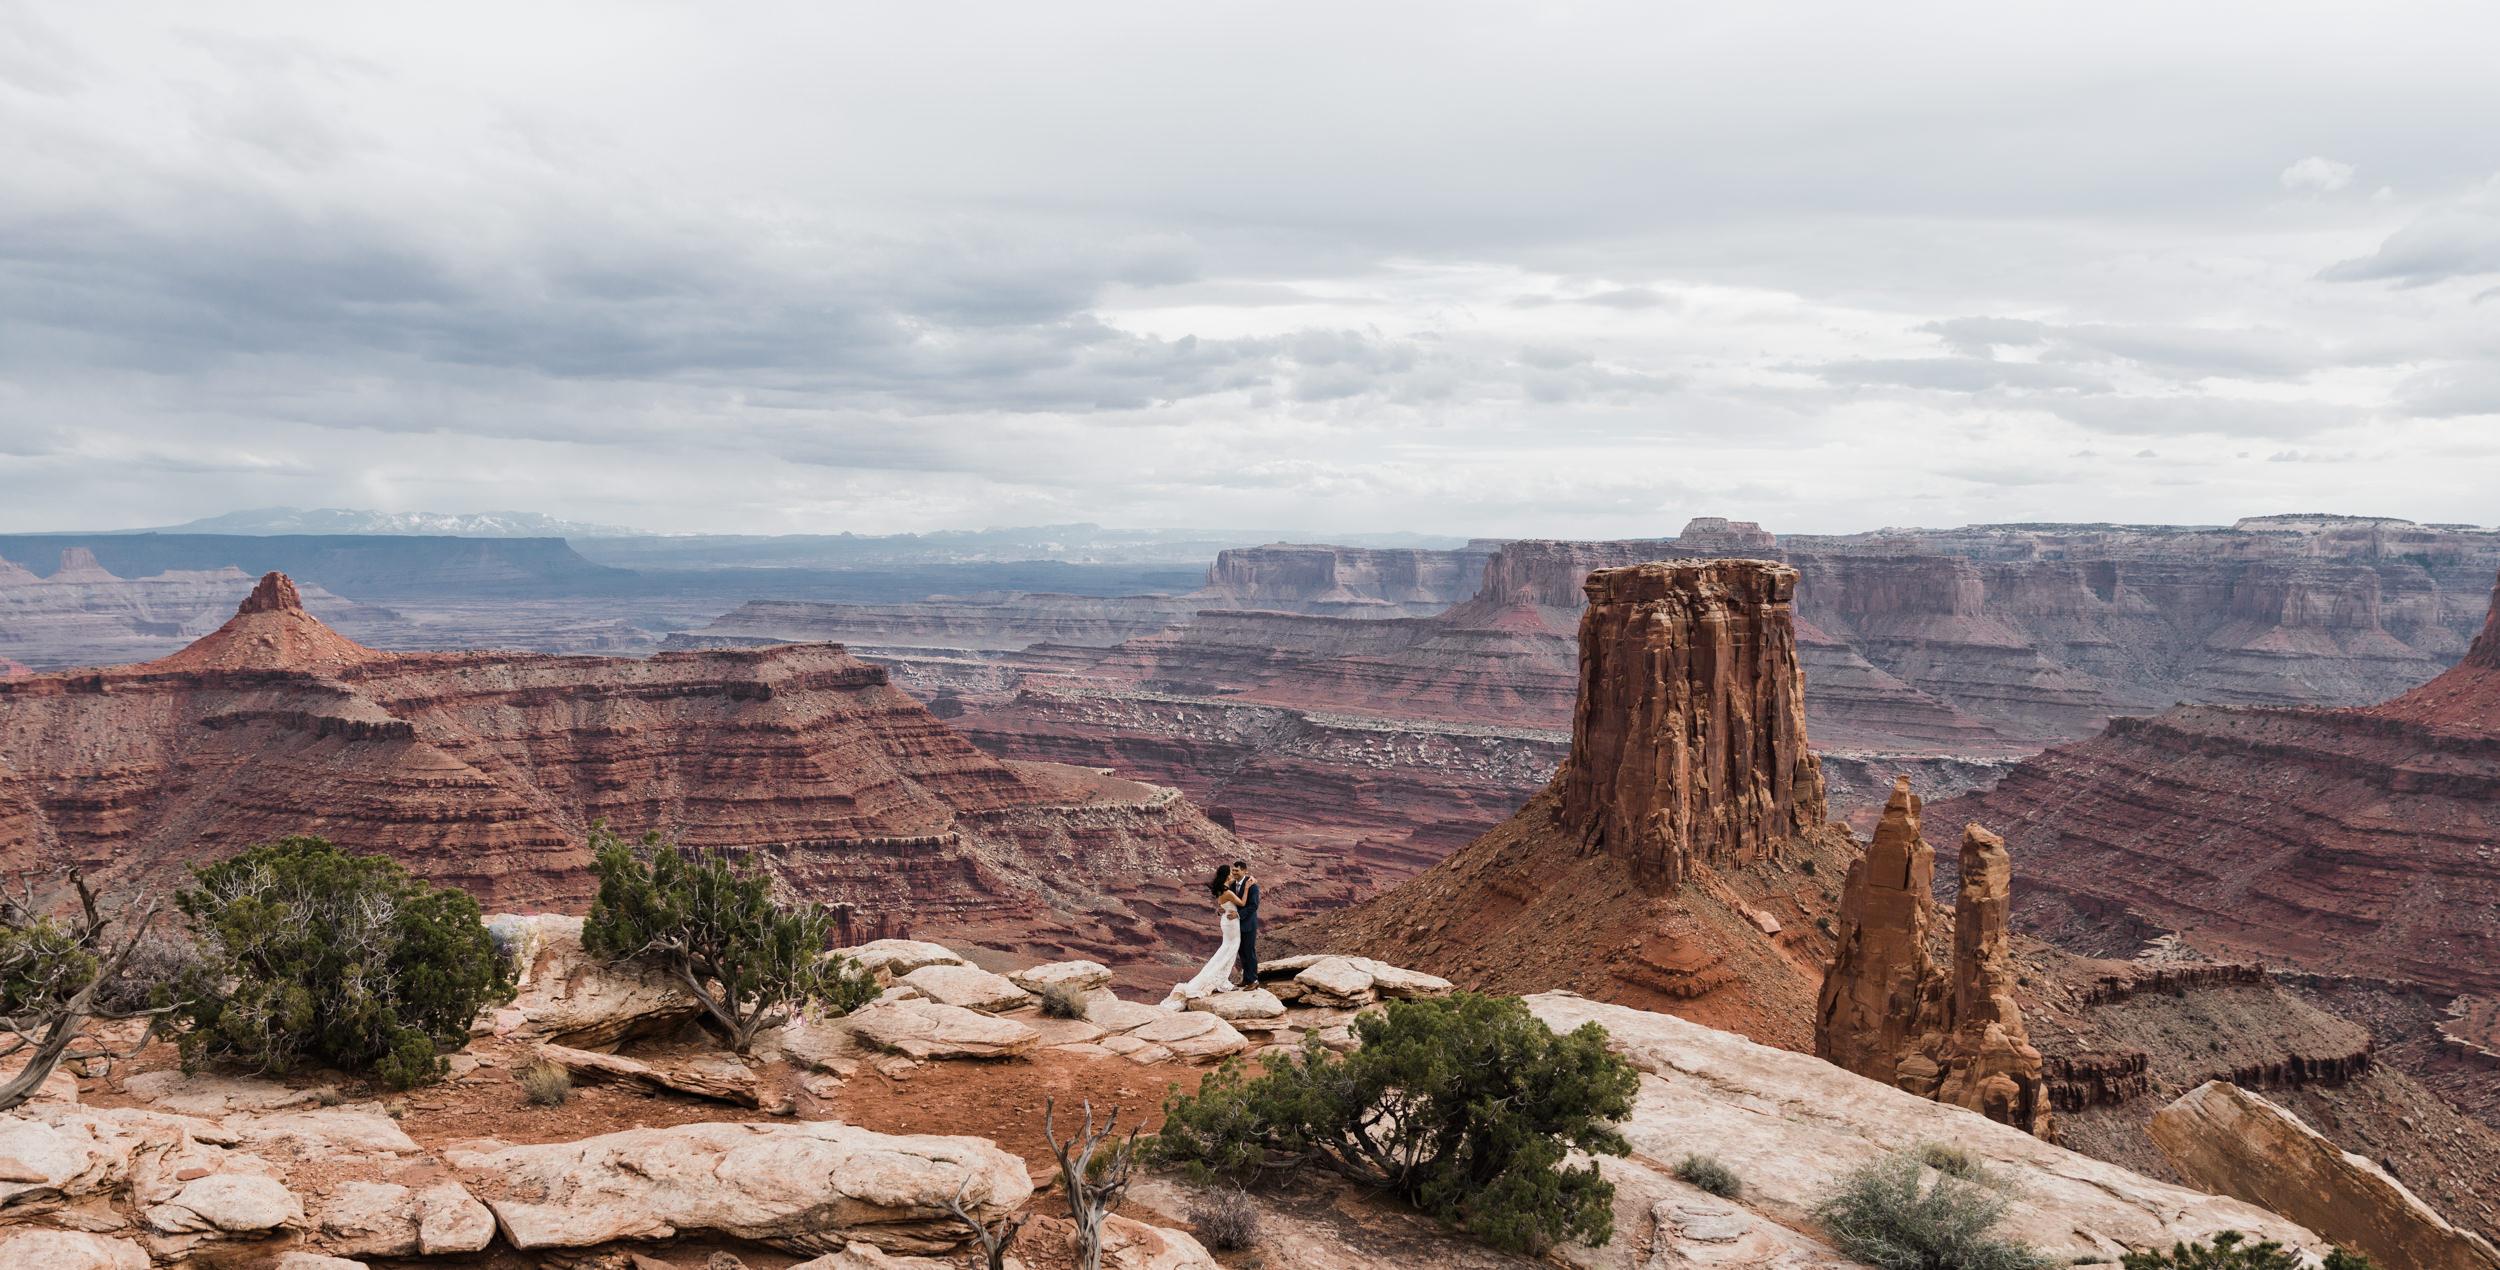 Jeep-Wedding-Moab-Utah-Hearnes-Adventure-Elopement-Photography-1.jpg